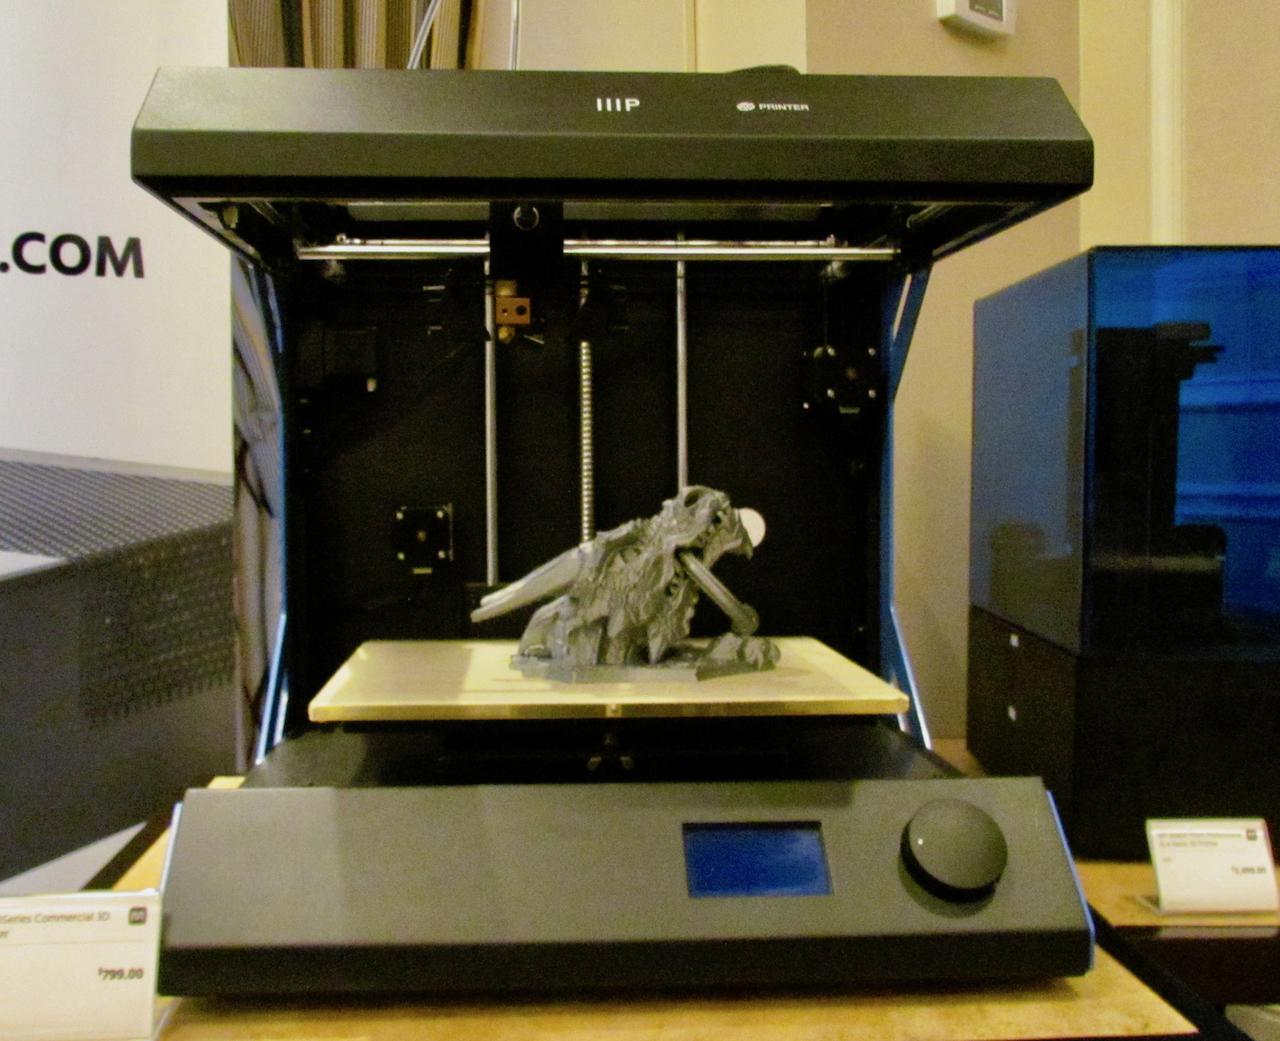 The new Monoprice 3Series Commercial professional desktop 3D printer